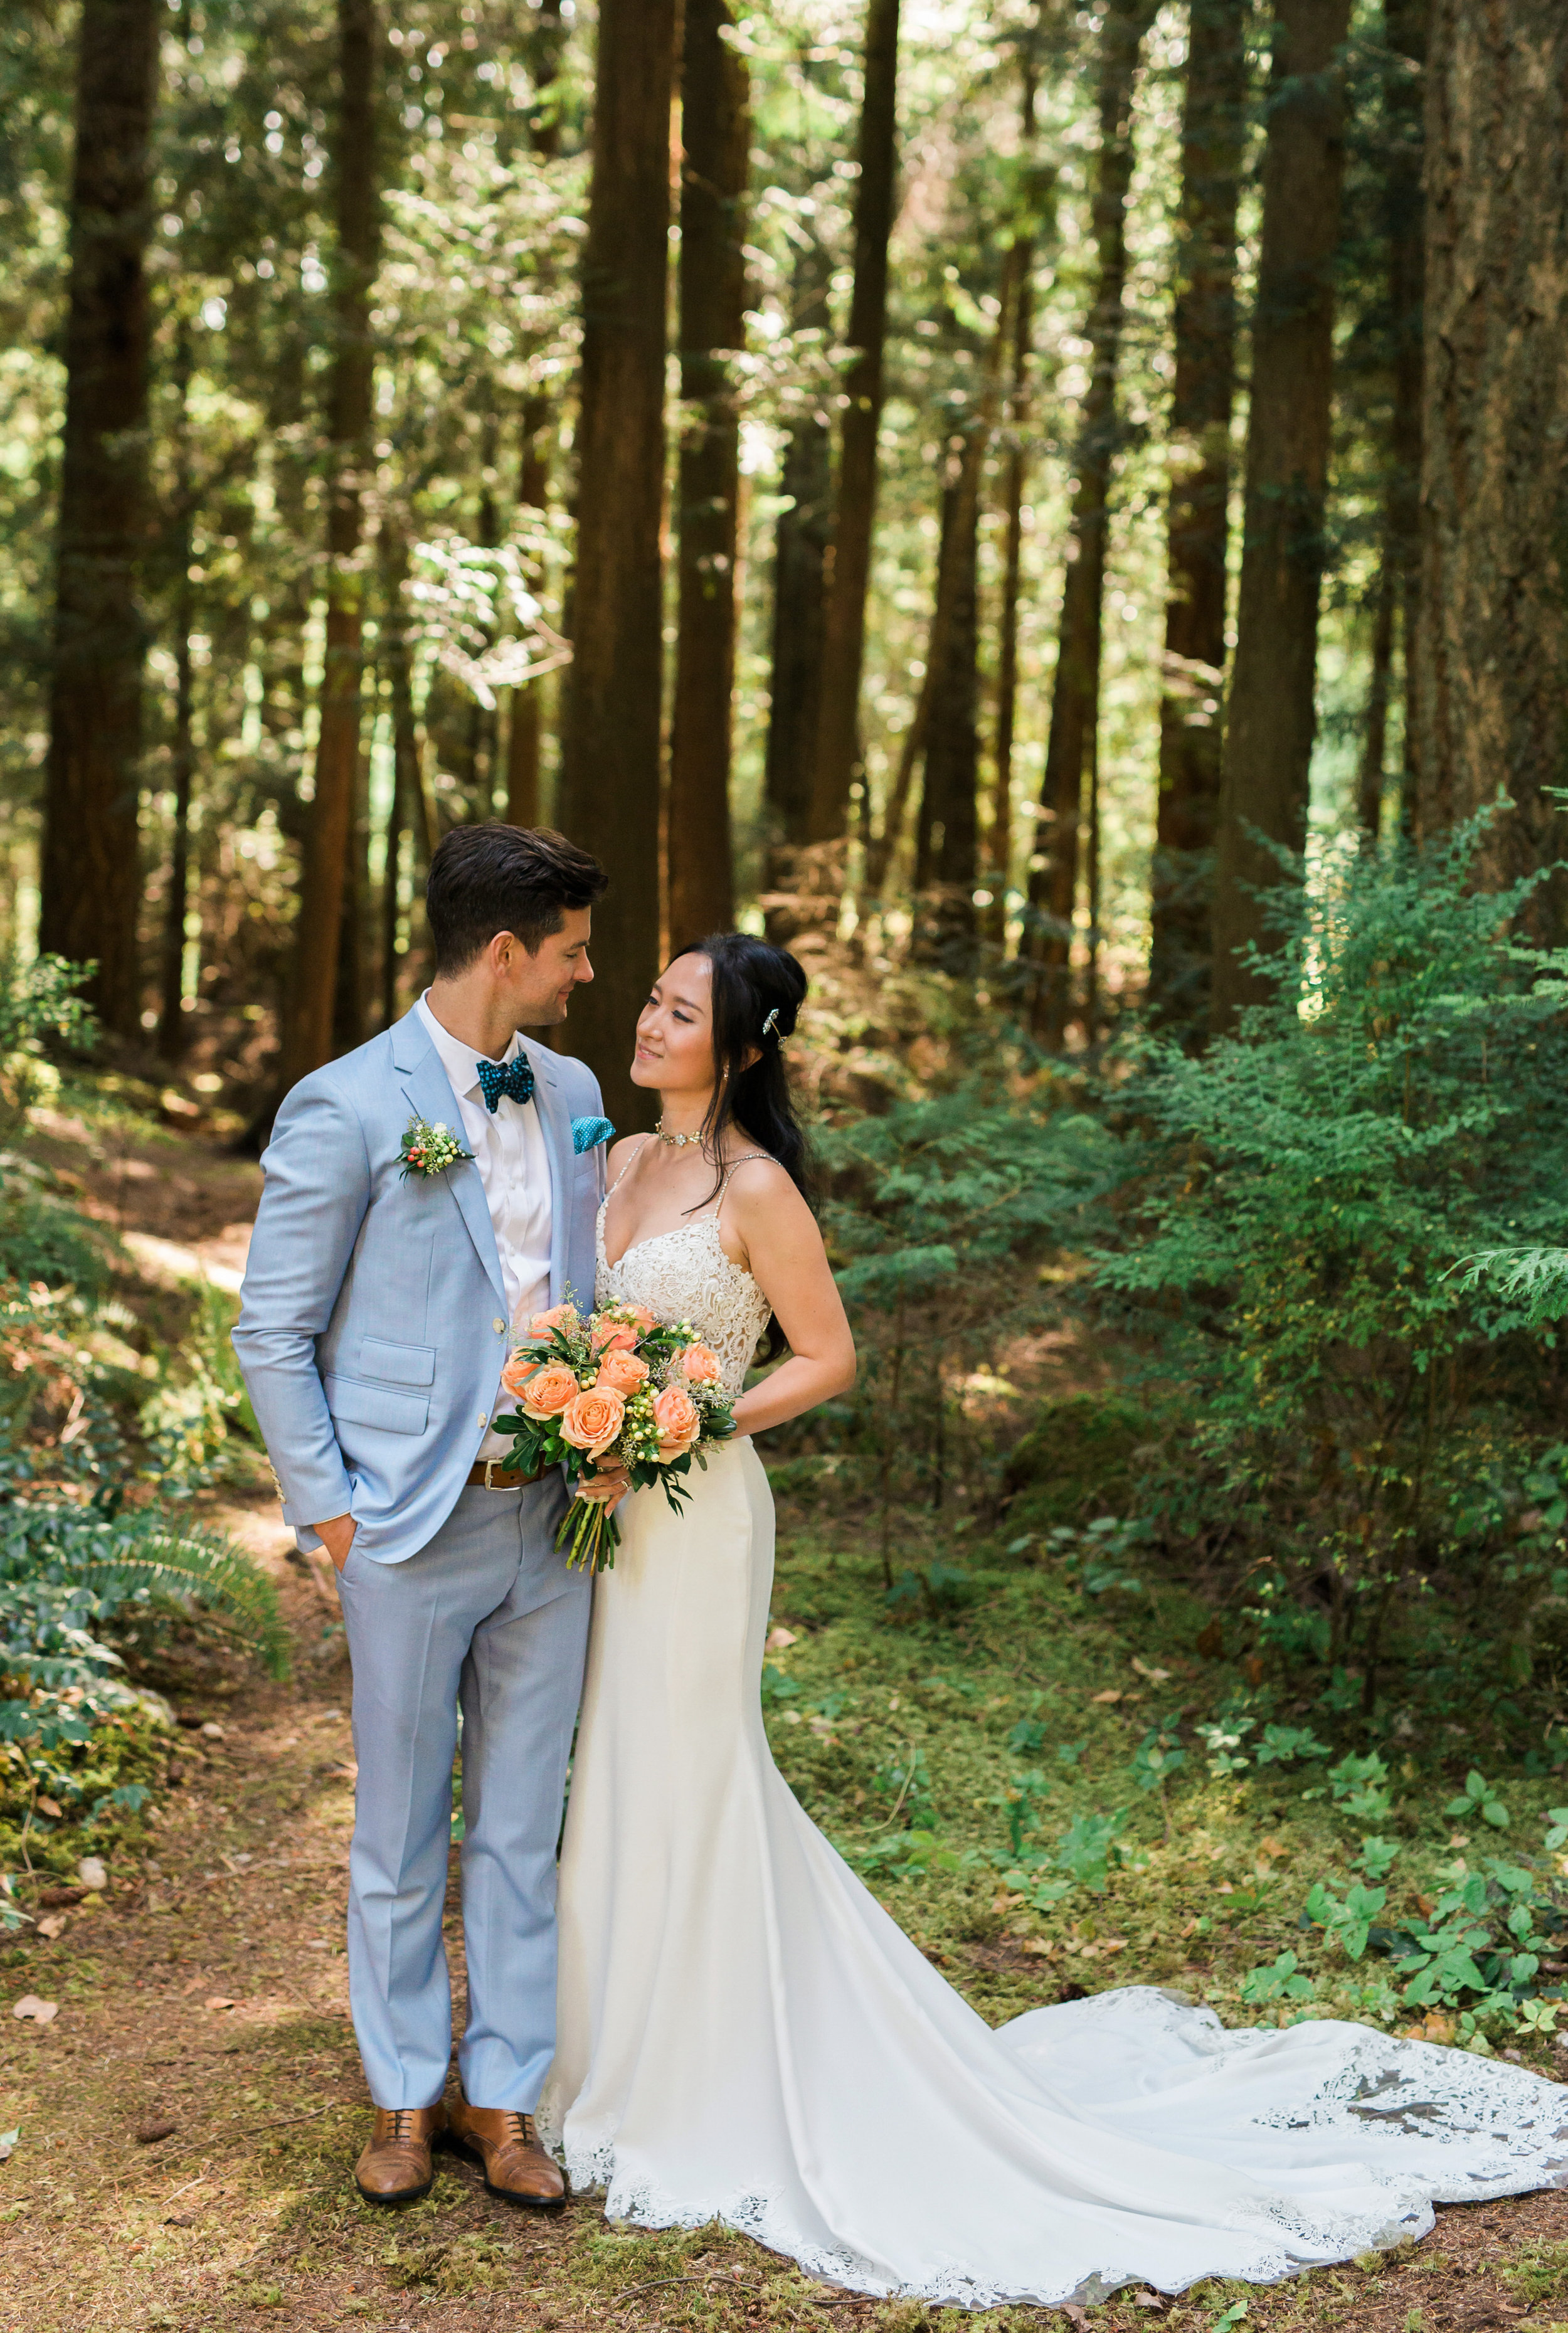 Linwood House Wedding Photos - Roberts Creek Wedding Photos - Vancouver Wedding Photographer & Videographer - Sunshine Coast Wedding Photos - Sunshine Coast Wedding Photographer - Jennifer Picard Photography - IMG_7515.jpg